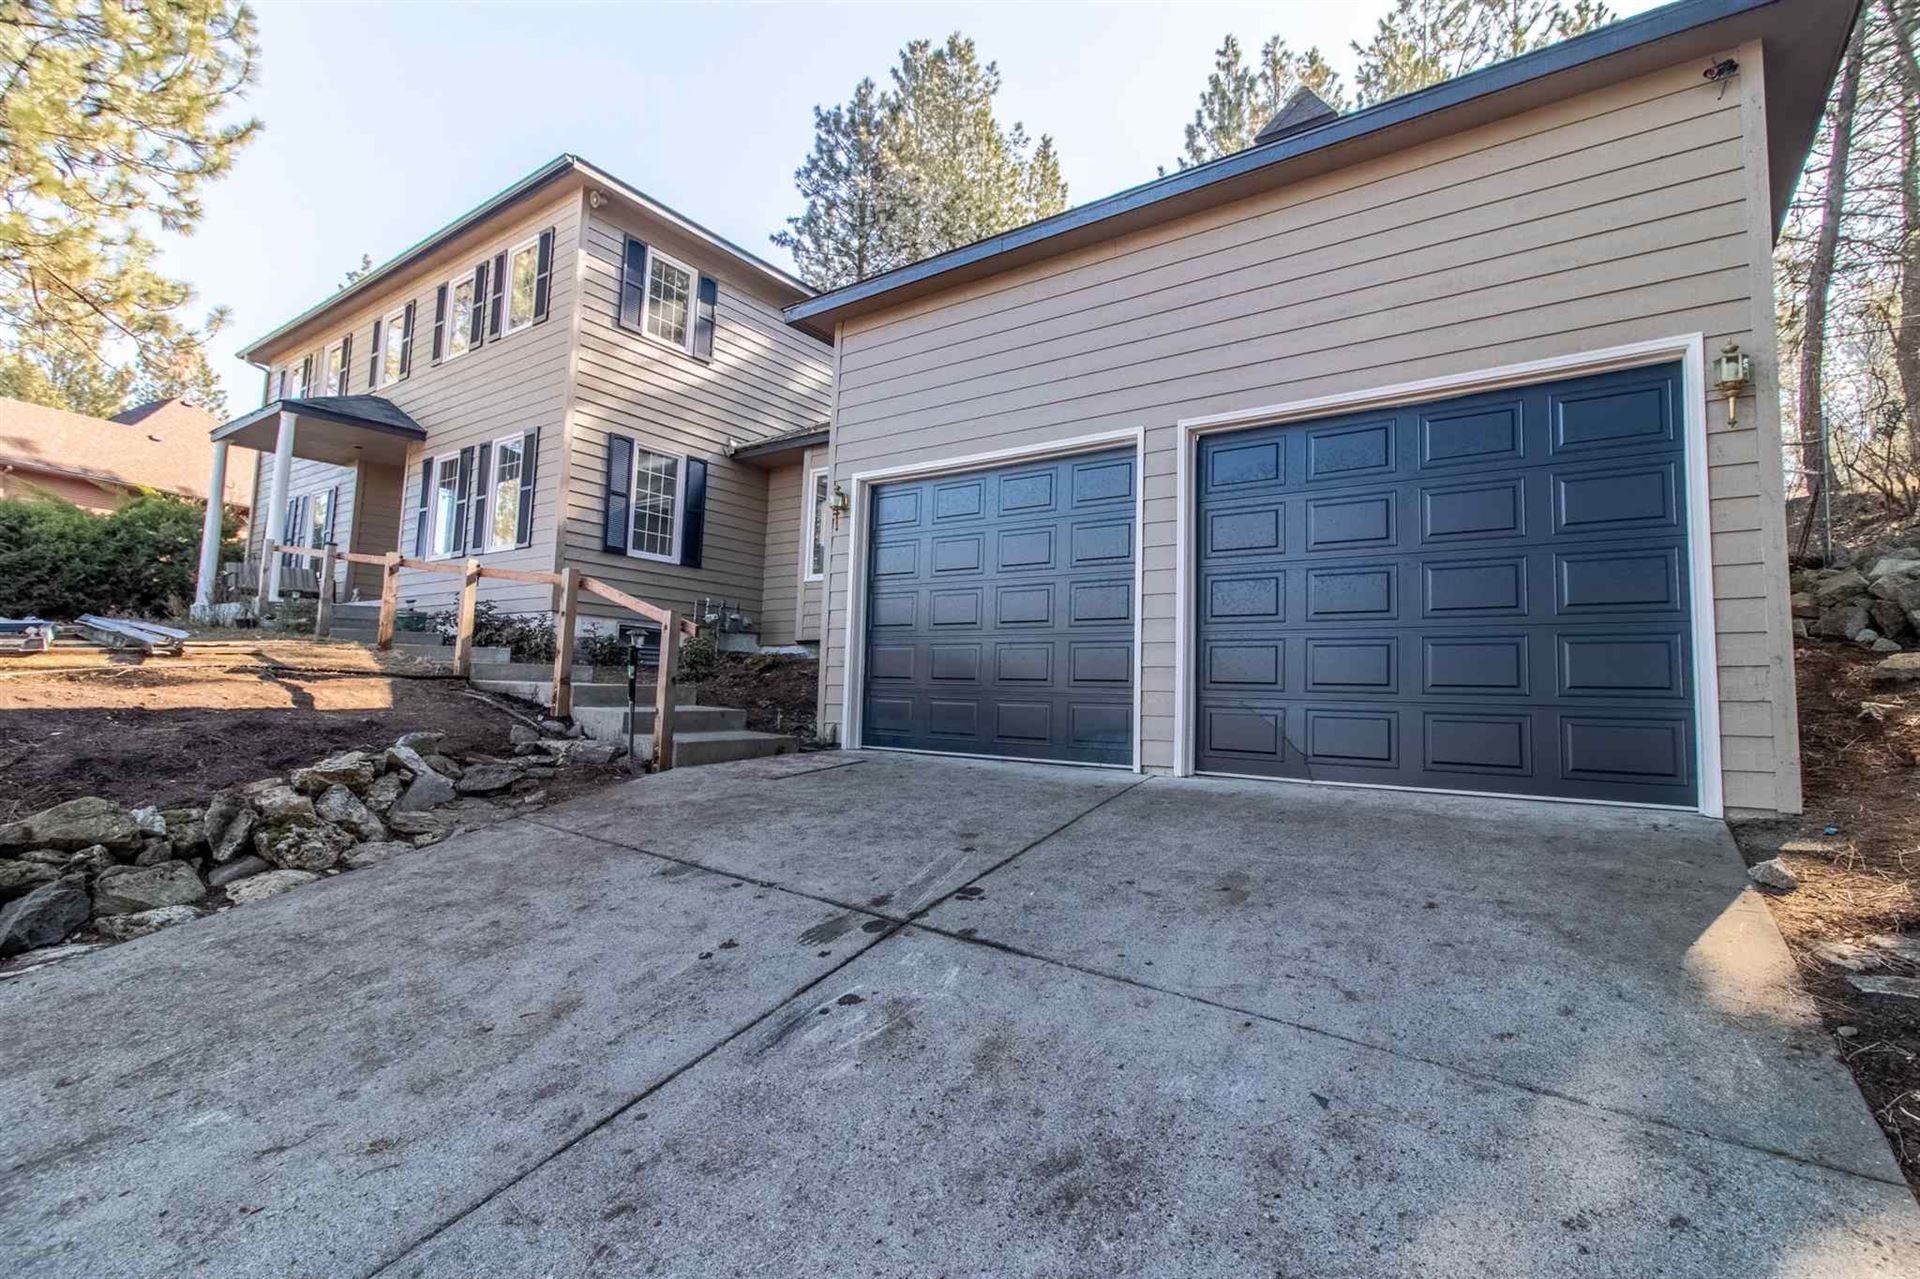 1407 S Kahuna Dr, Spokane Valley, WA 99212 - #: 202112023